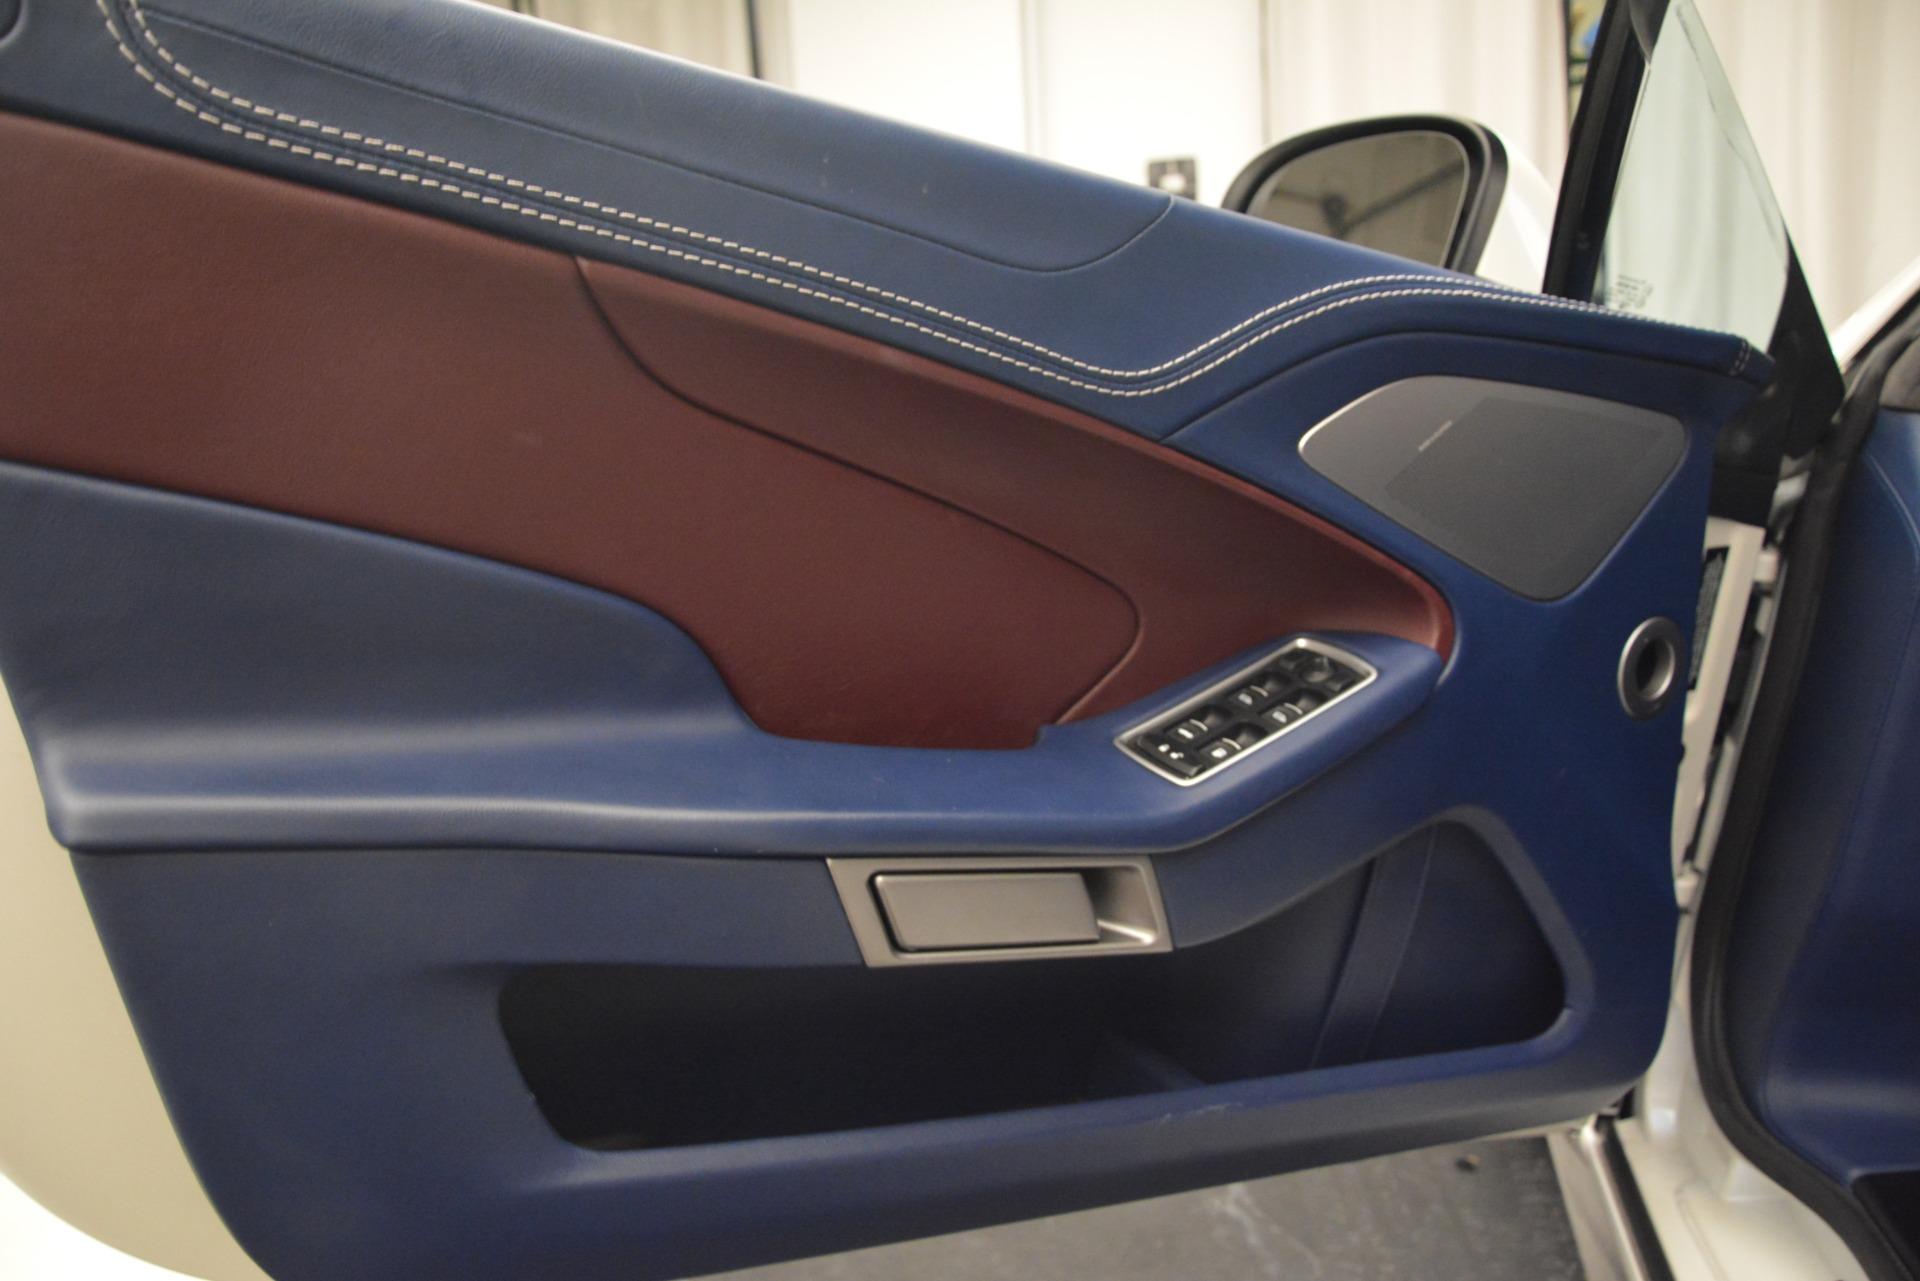 Used 2015 Aston Martin Vanquish Convertible For Sale In Greenwich, CT. Alfa Romeo of Greenwich, 7507 2982_p24